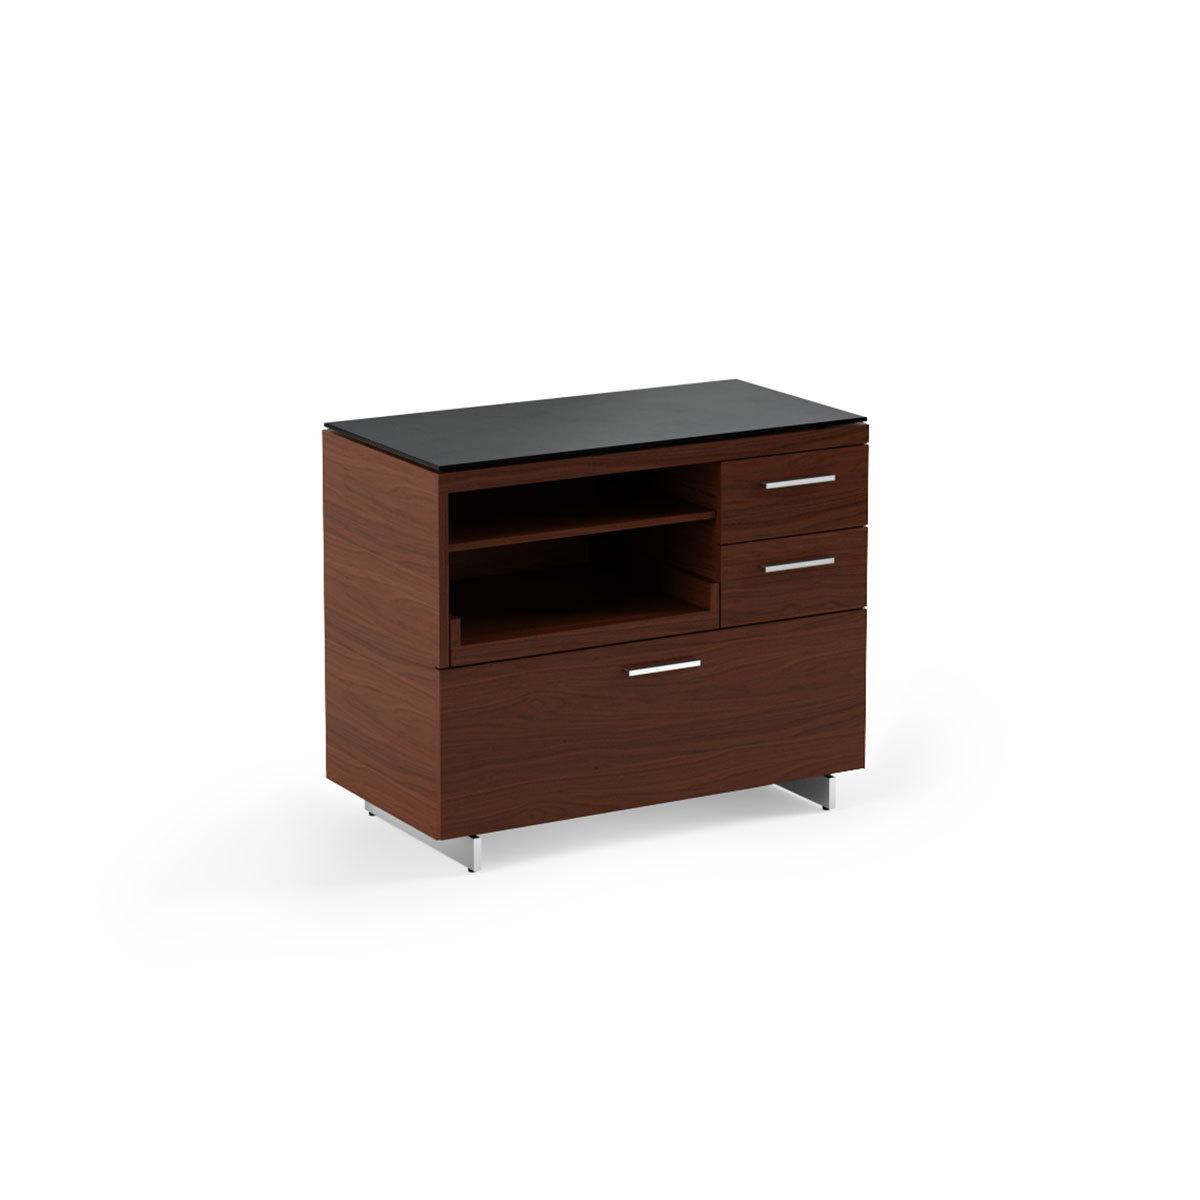 Sequel Multifunction Cabinet 6017 Bdi Furniture